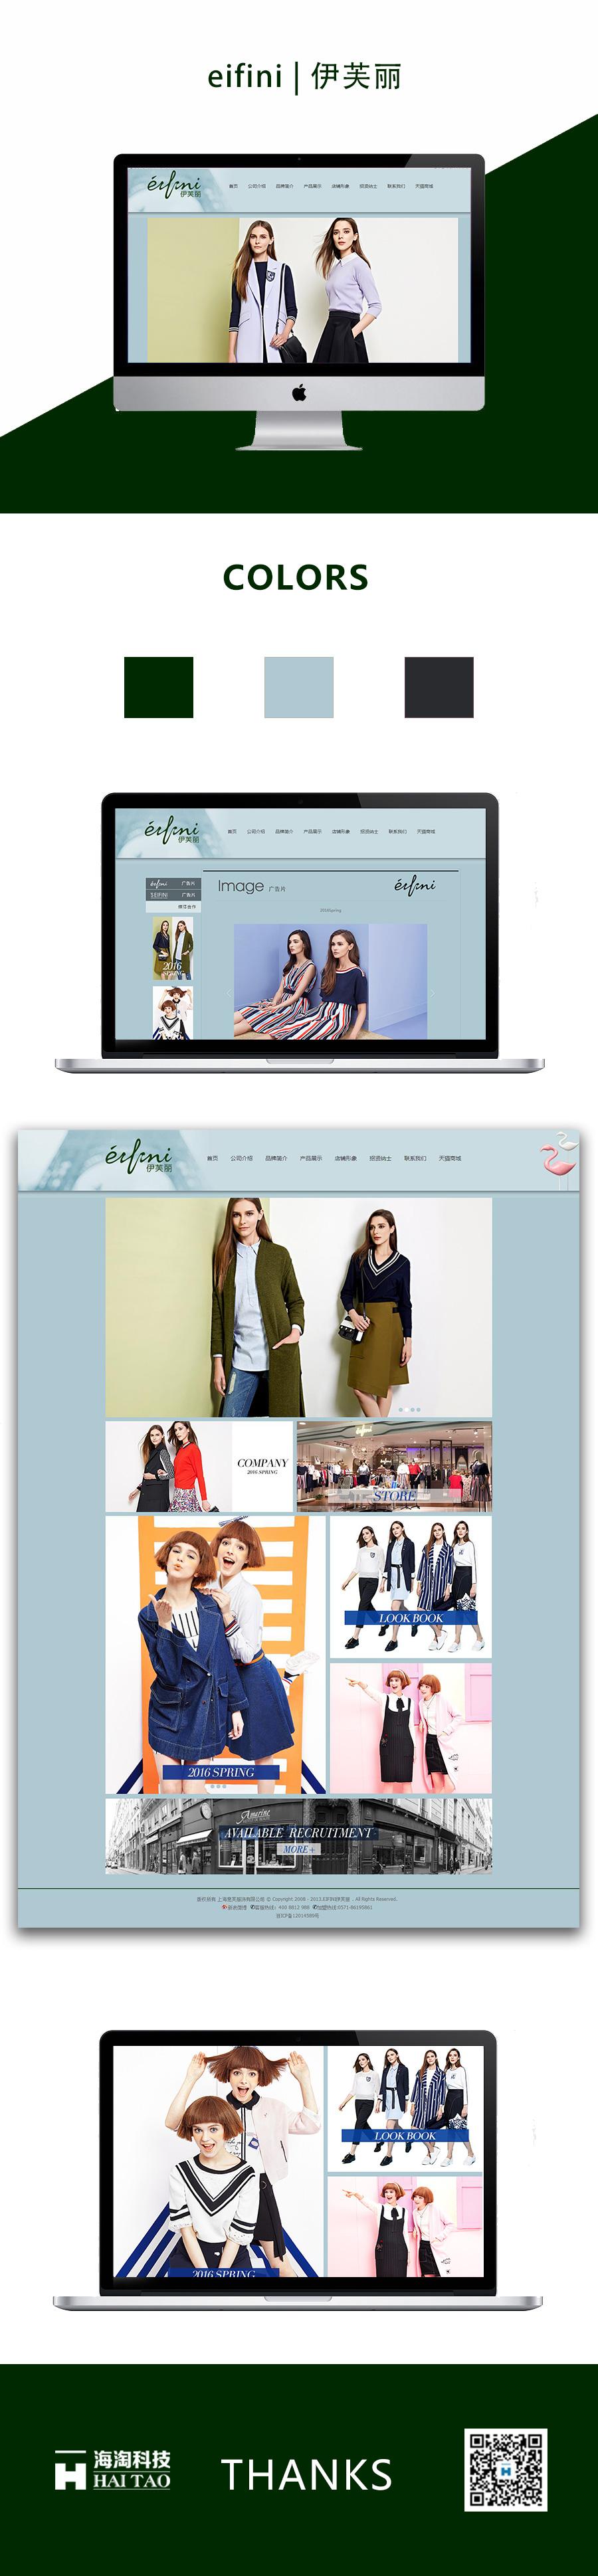 EIFINI | 伊芙丽服装品牌案例_服装品牌网建设案例